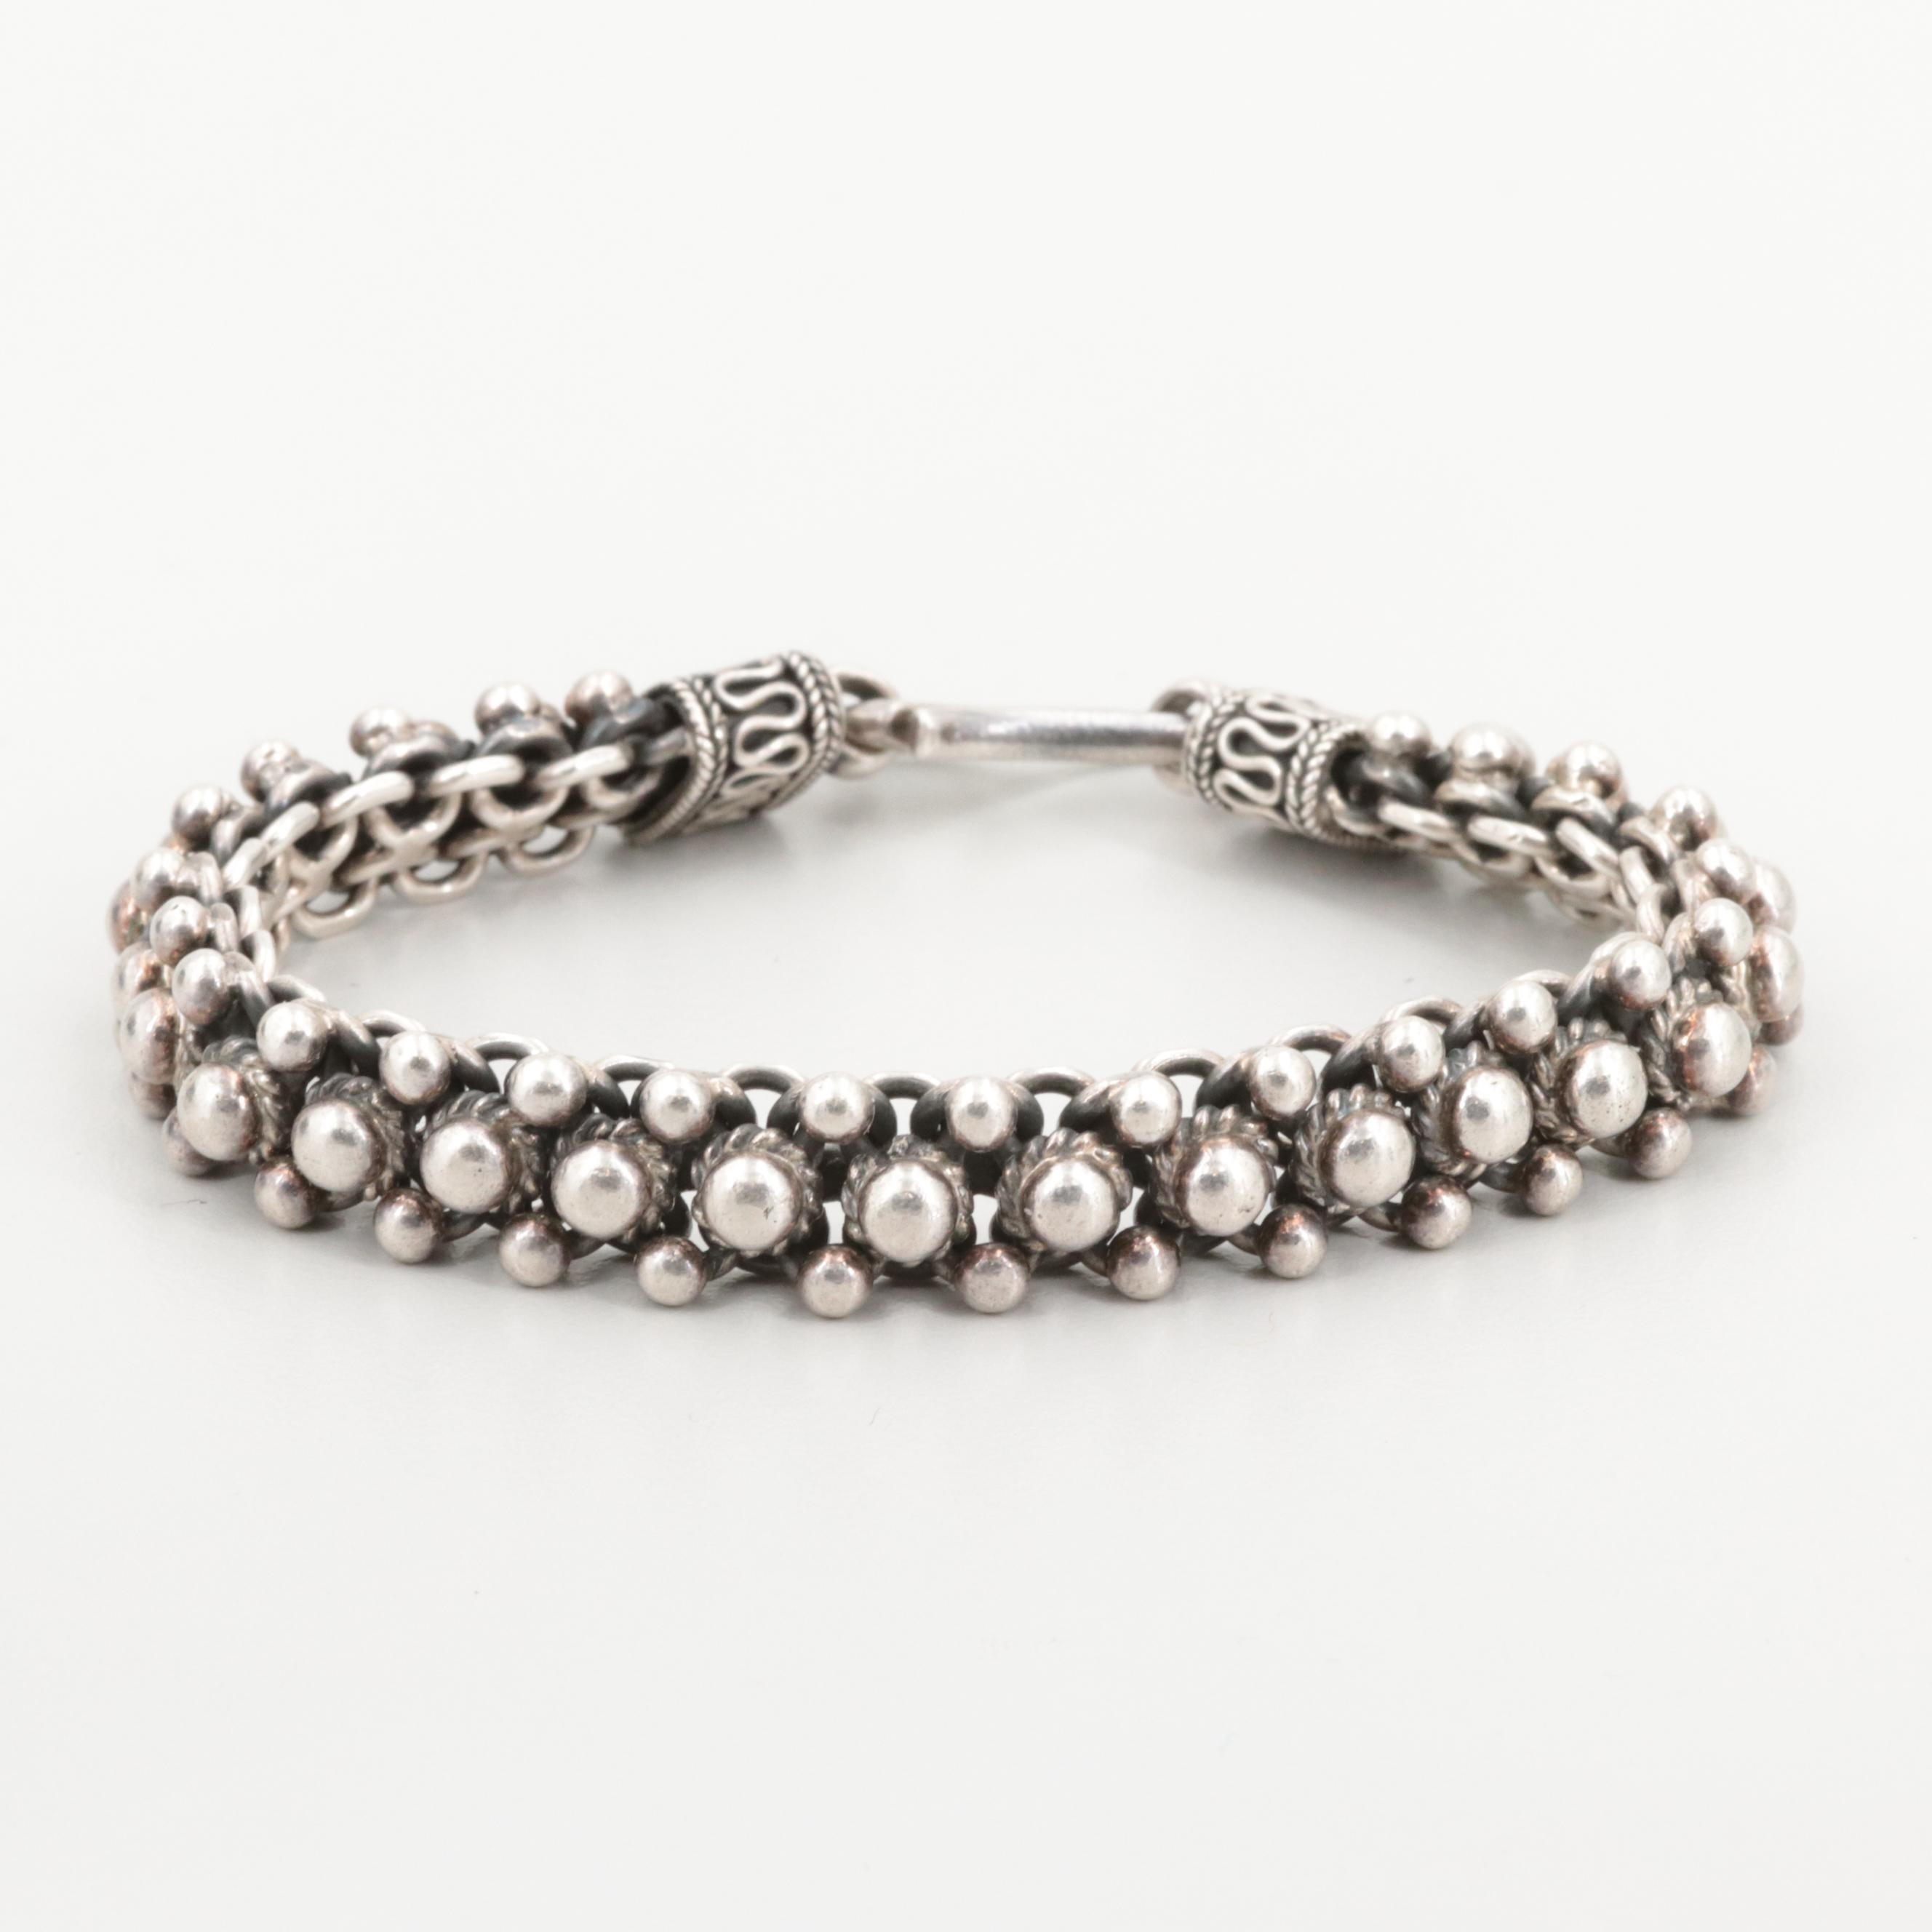 Suarti of Bali Sterling Silver Bracelet